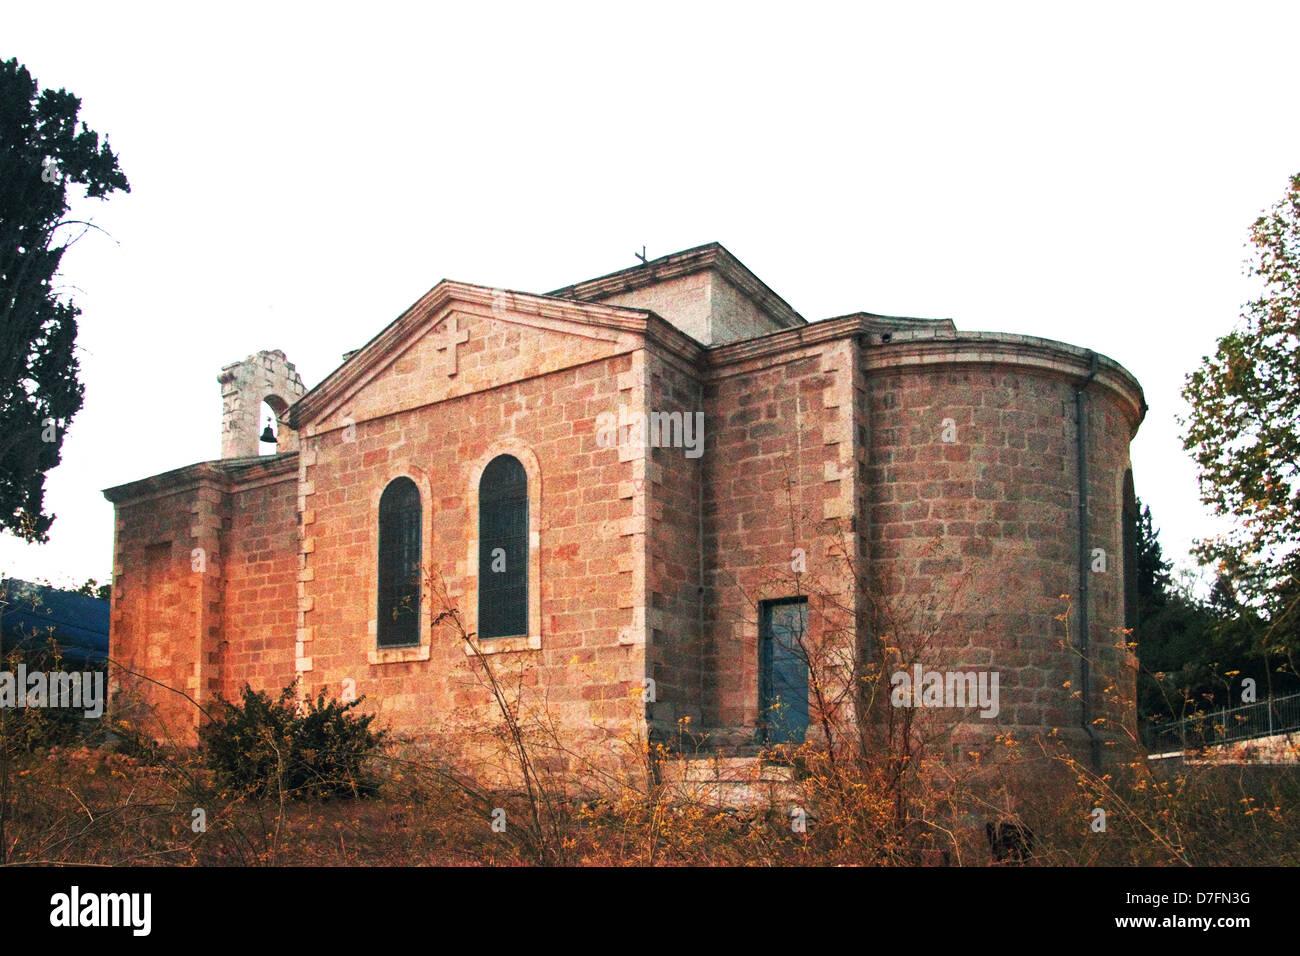 Saint John the Baptist convent in Ein Kerem, Jerusalem - Stock Image